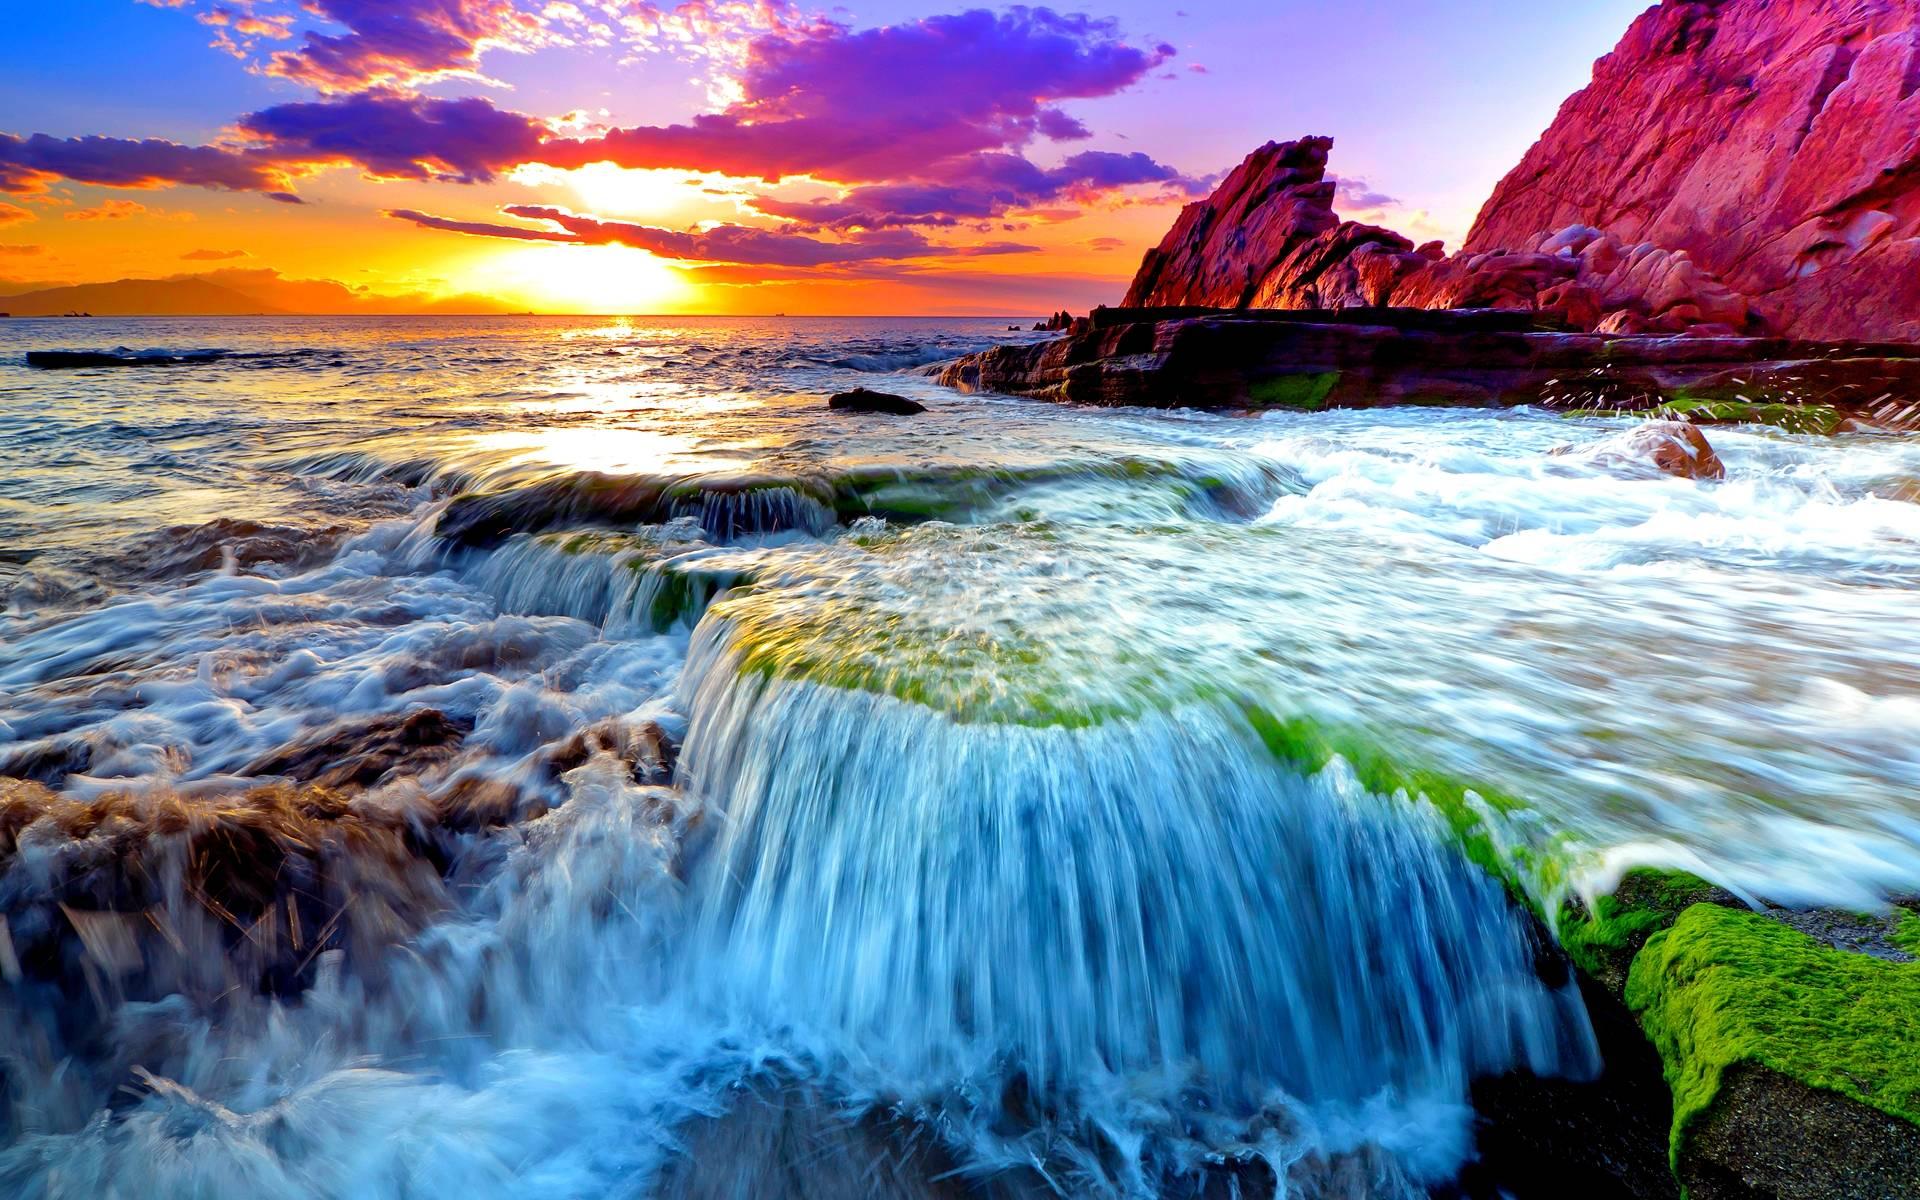 Oceans wallpaper